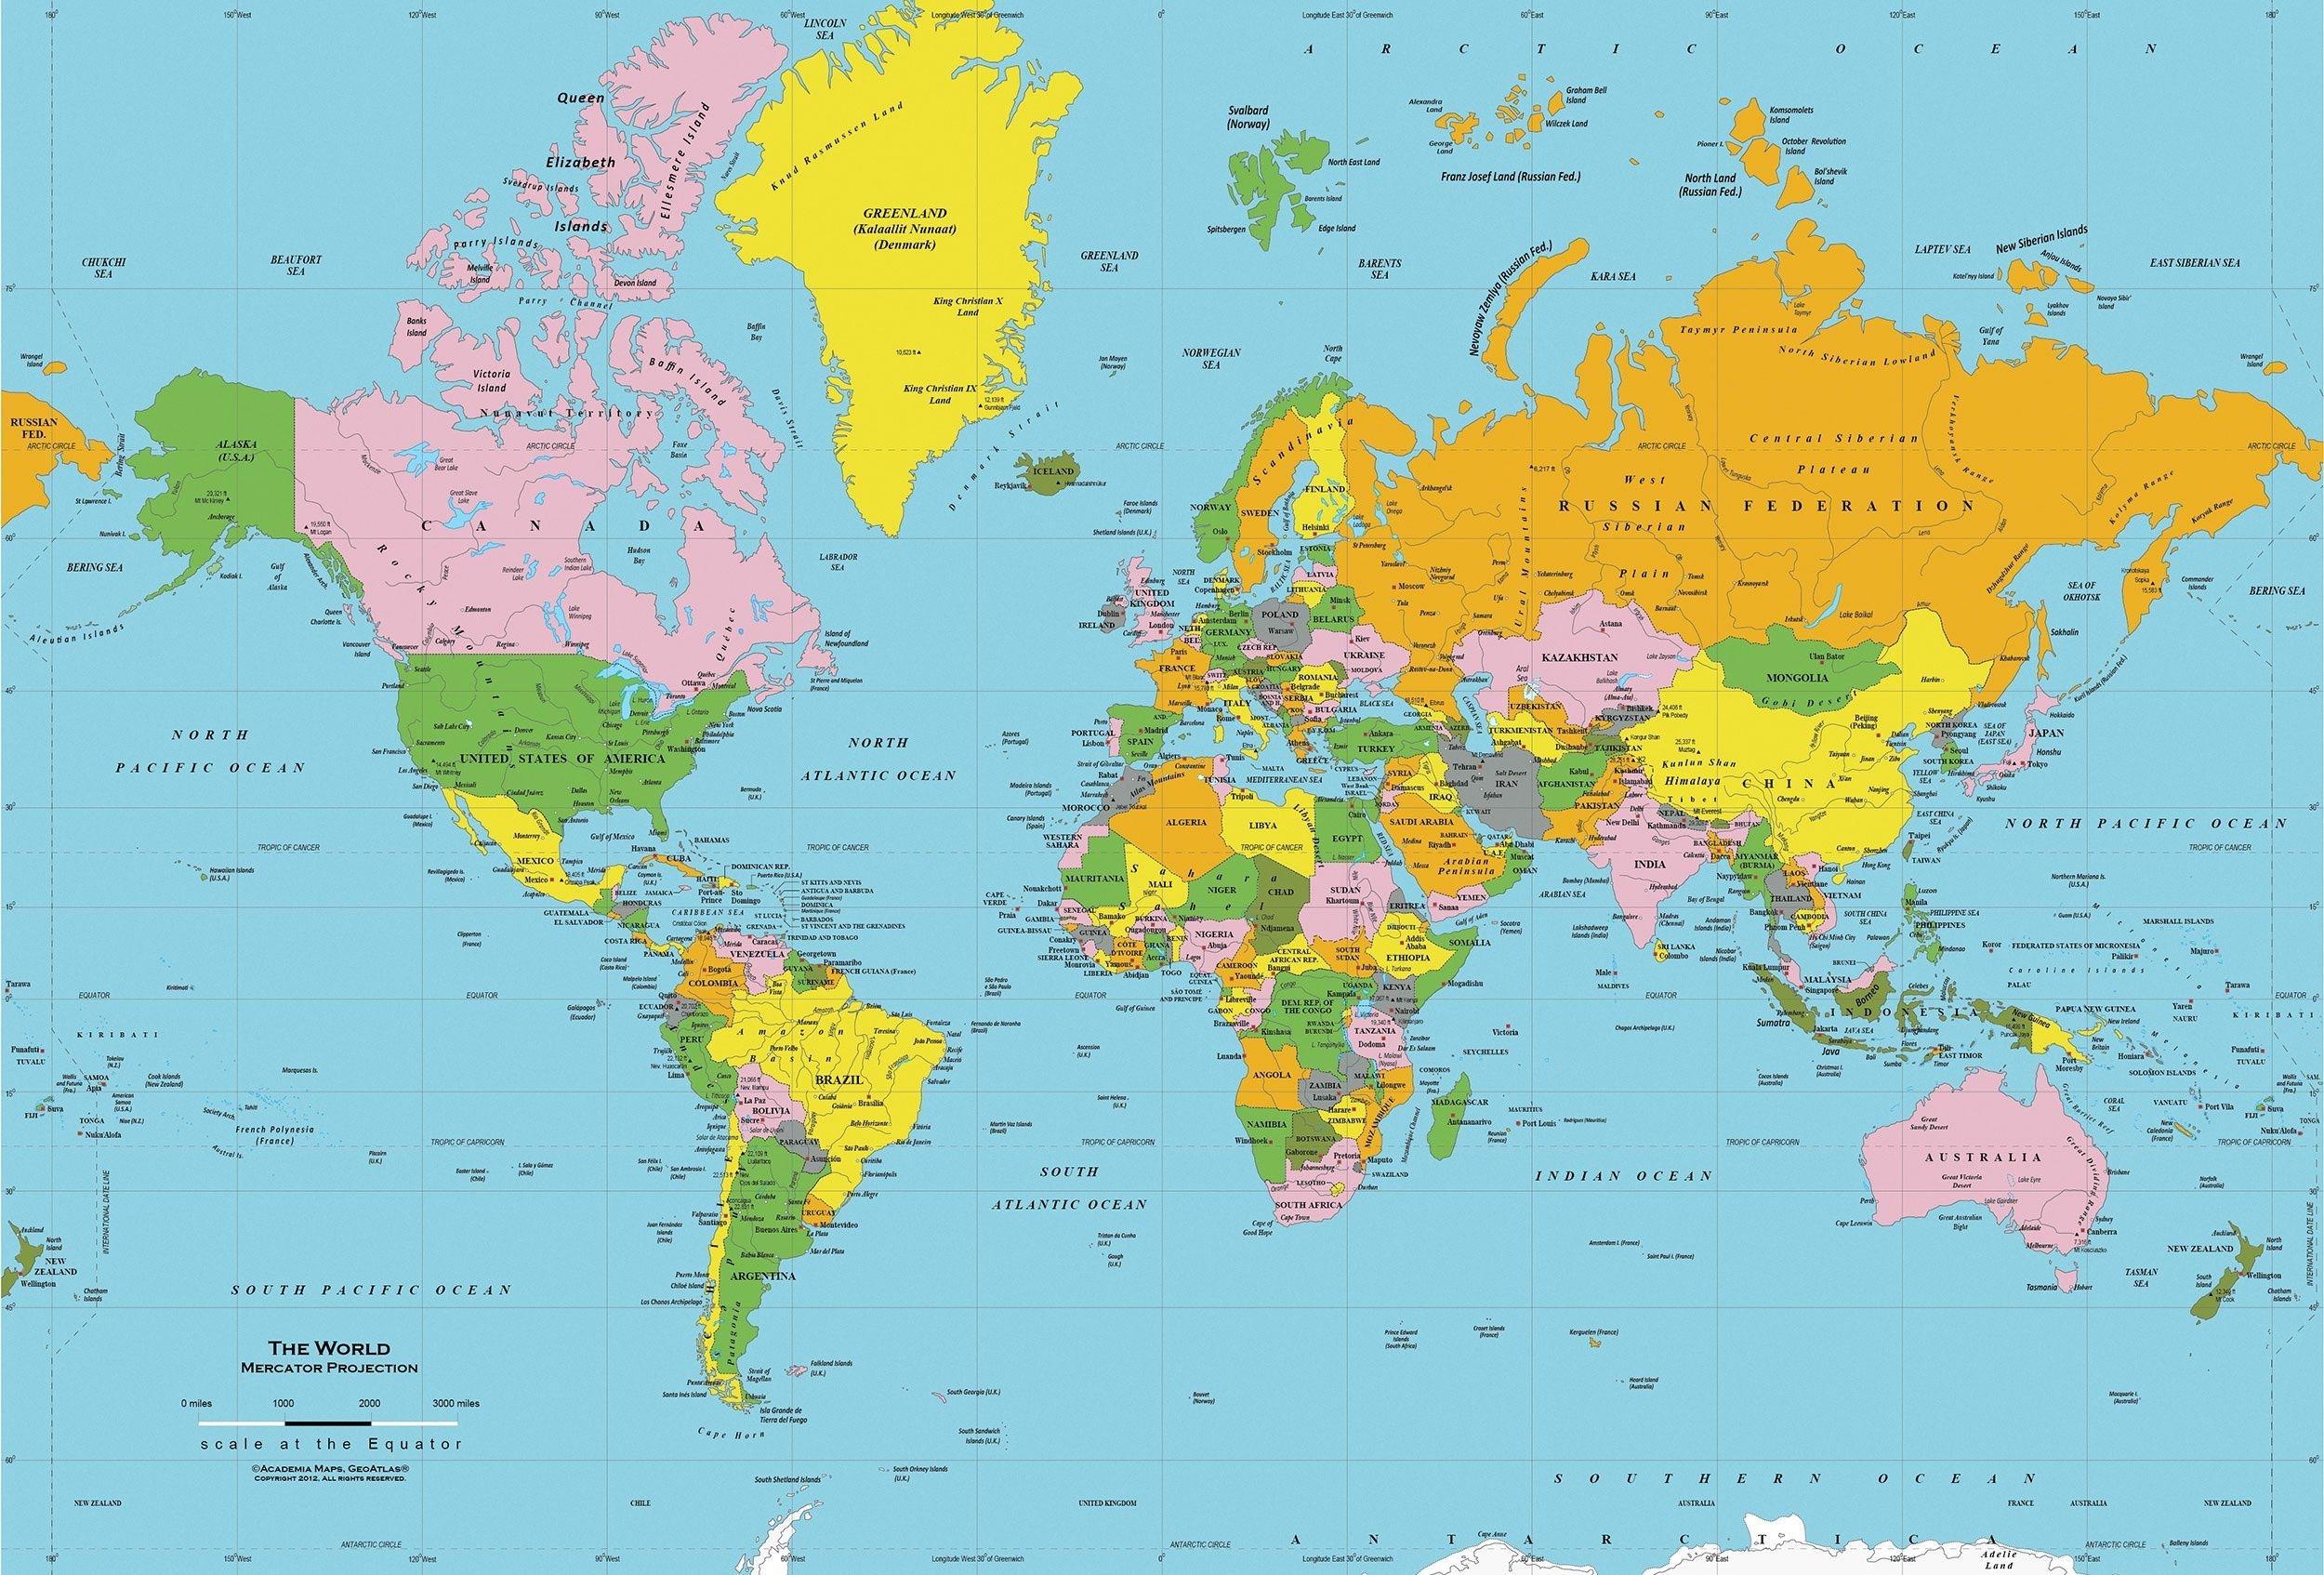 Printable World Map Free   Sitedesignco - Free Printable World Map